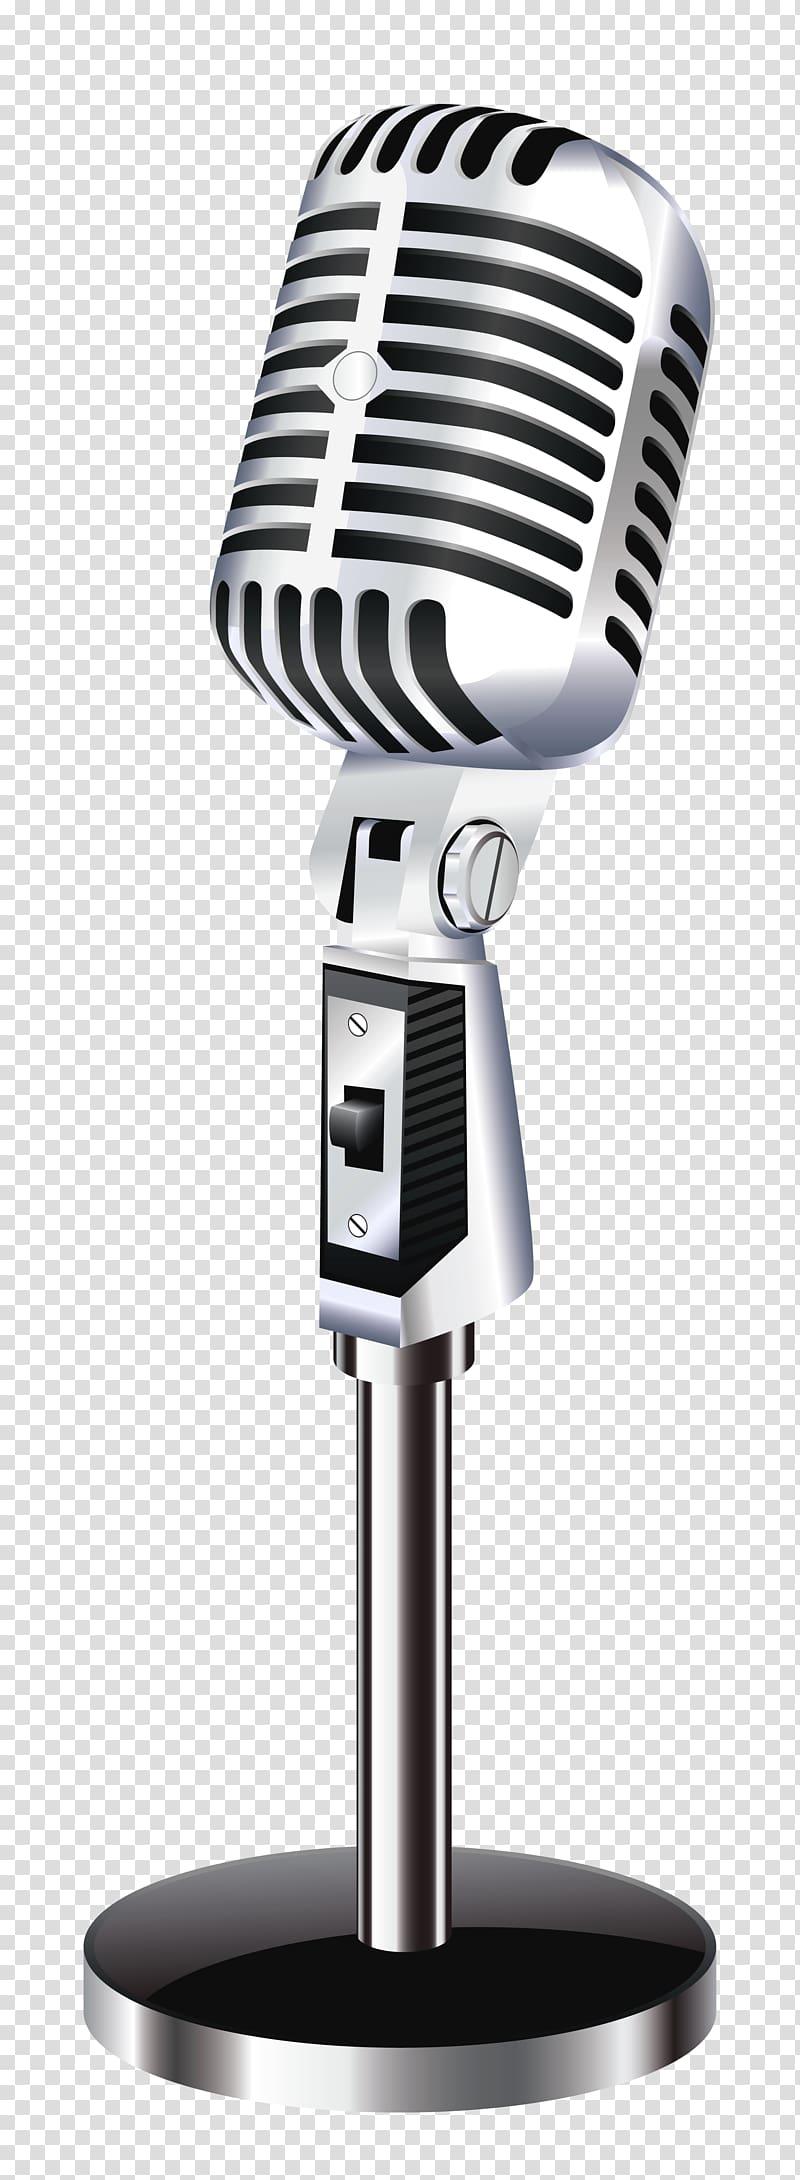 Microphone, Retro Microphone , silver condenser microphone.